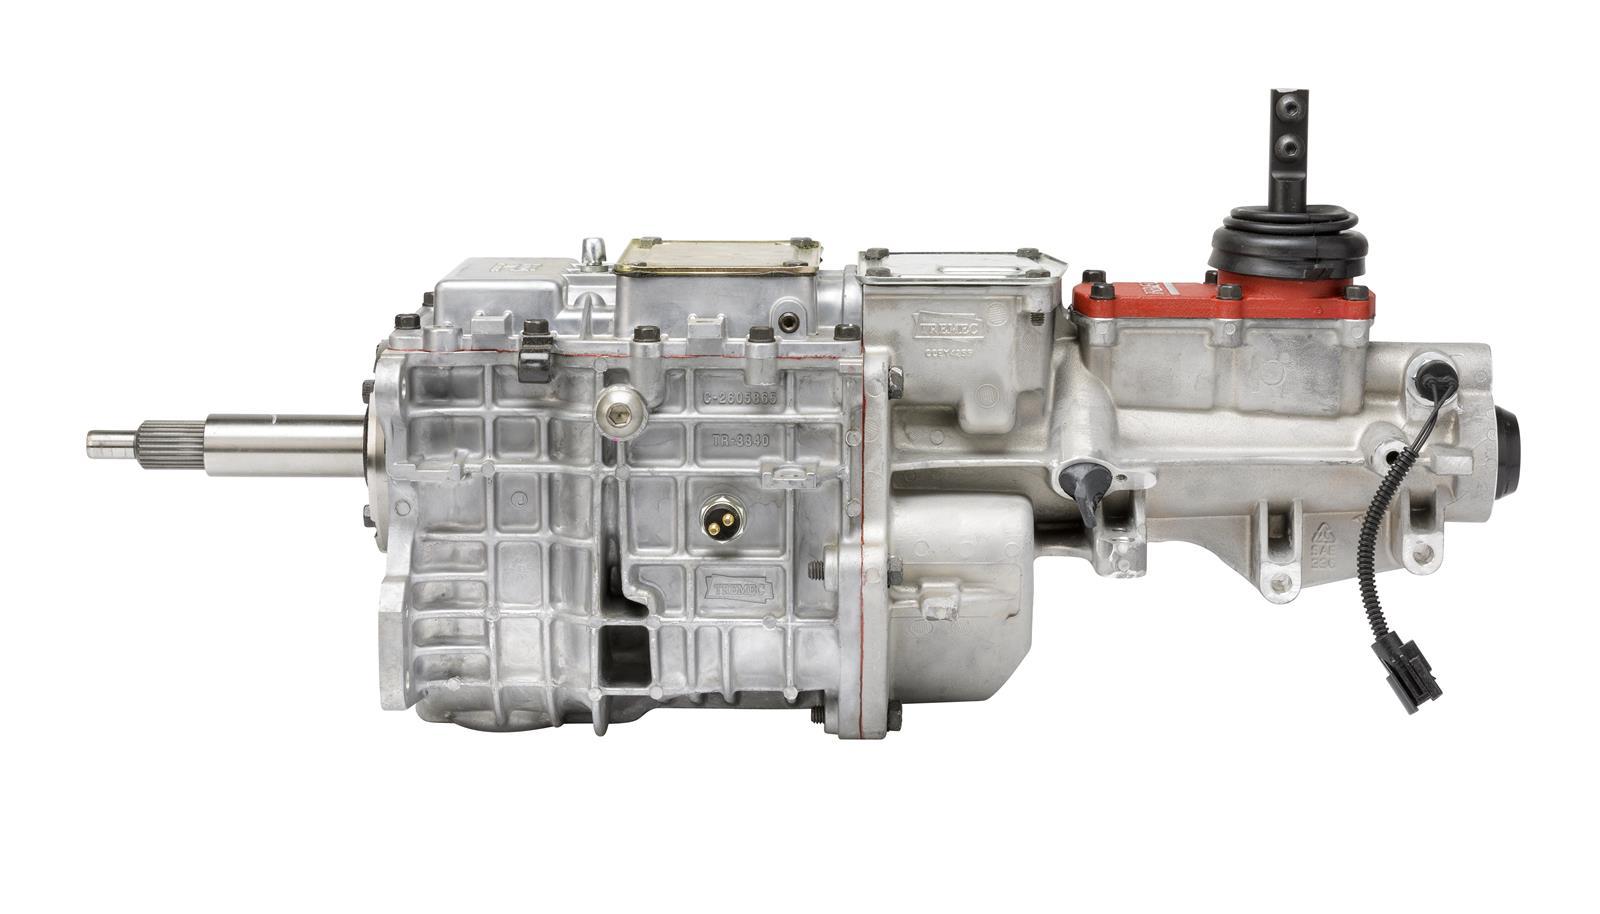 American Powertrain Tremec TKO 600 Manual Transmissions TCET-5009